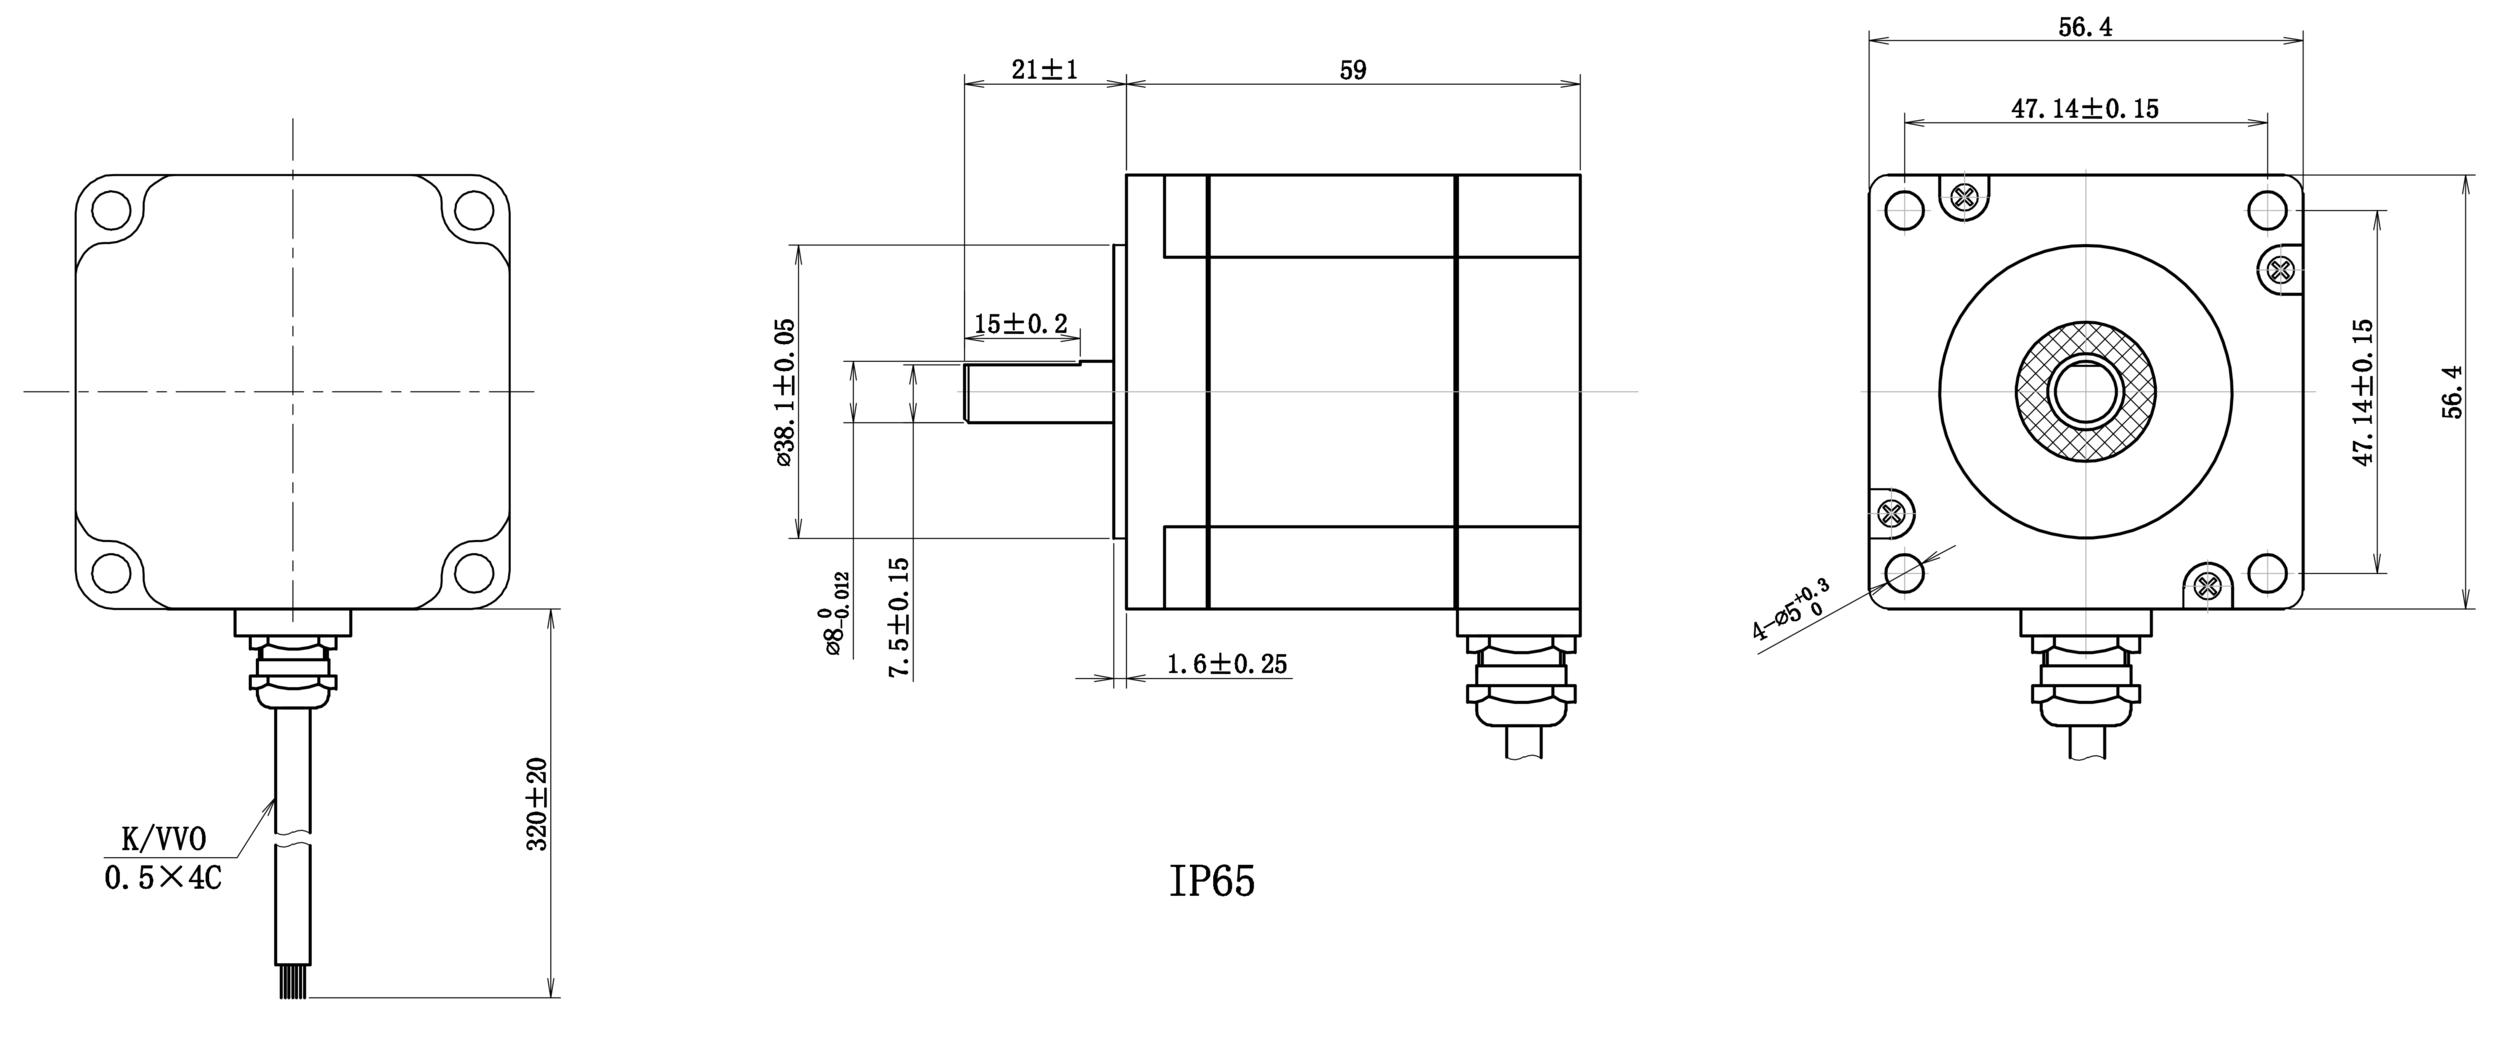 NEMA 23 IP65 Rotary Stepper Motor Drawing